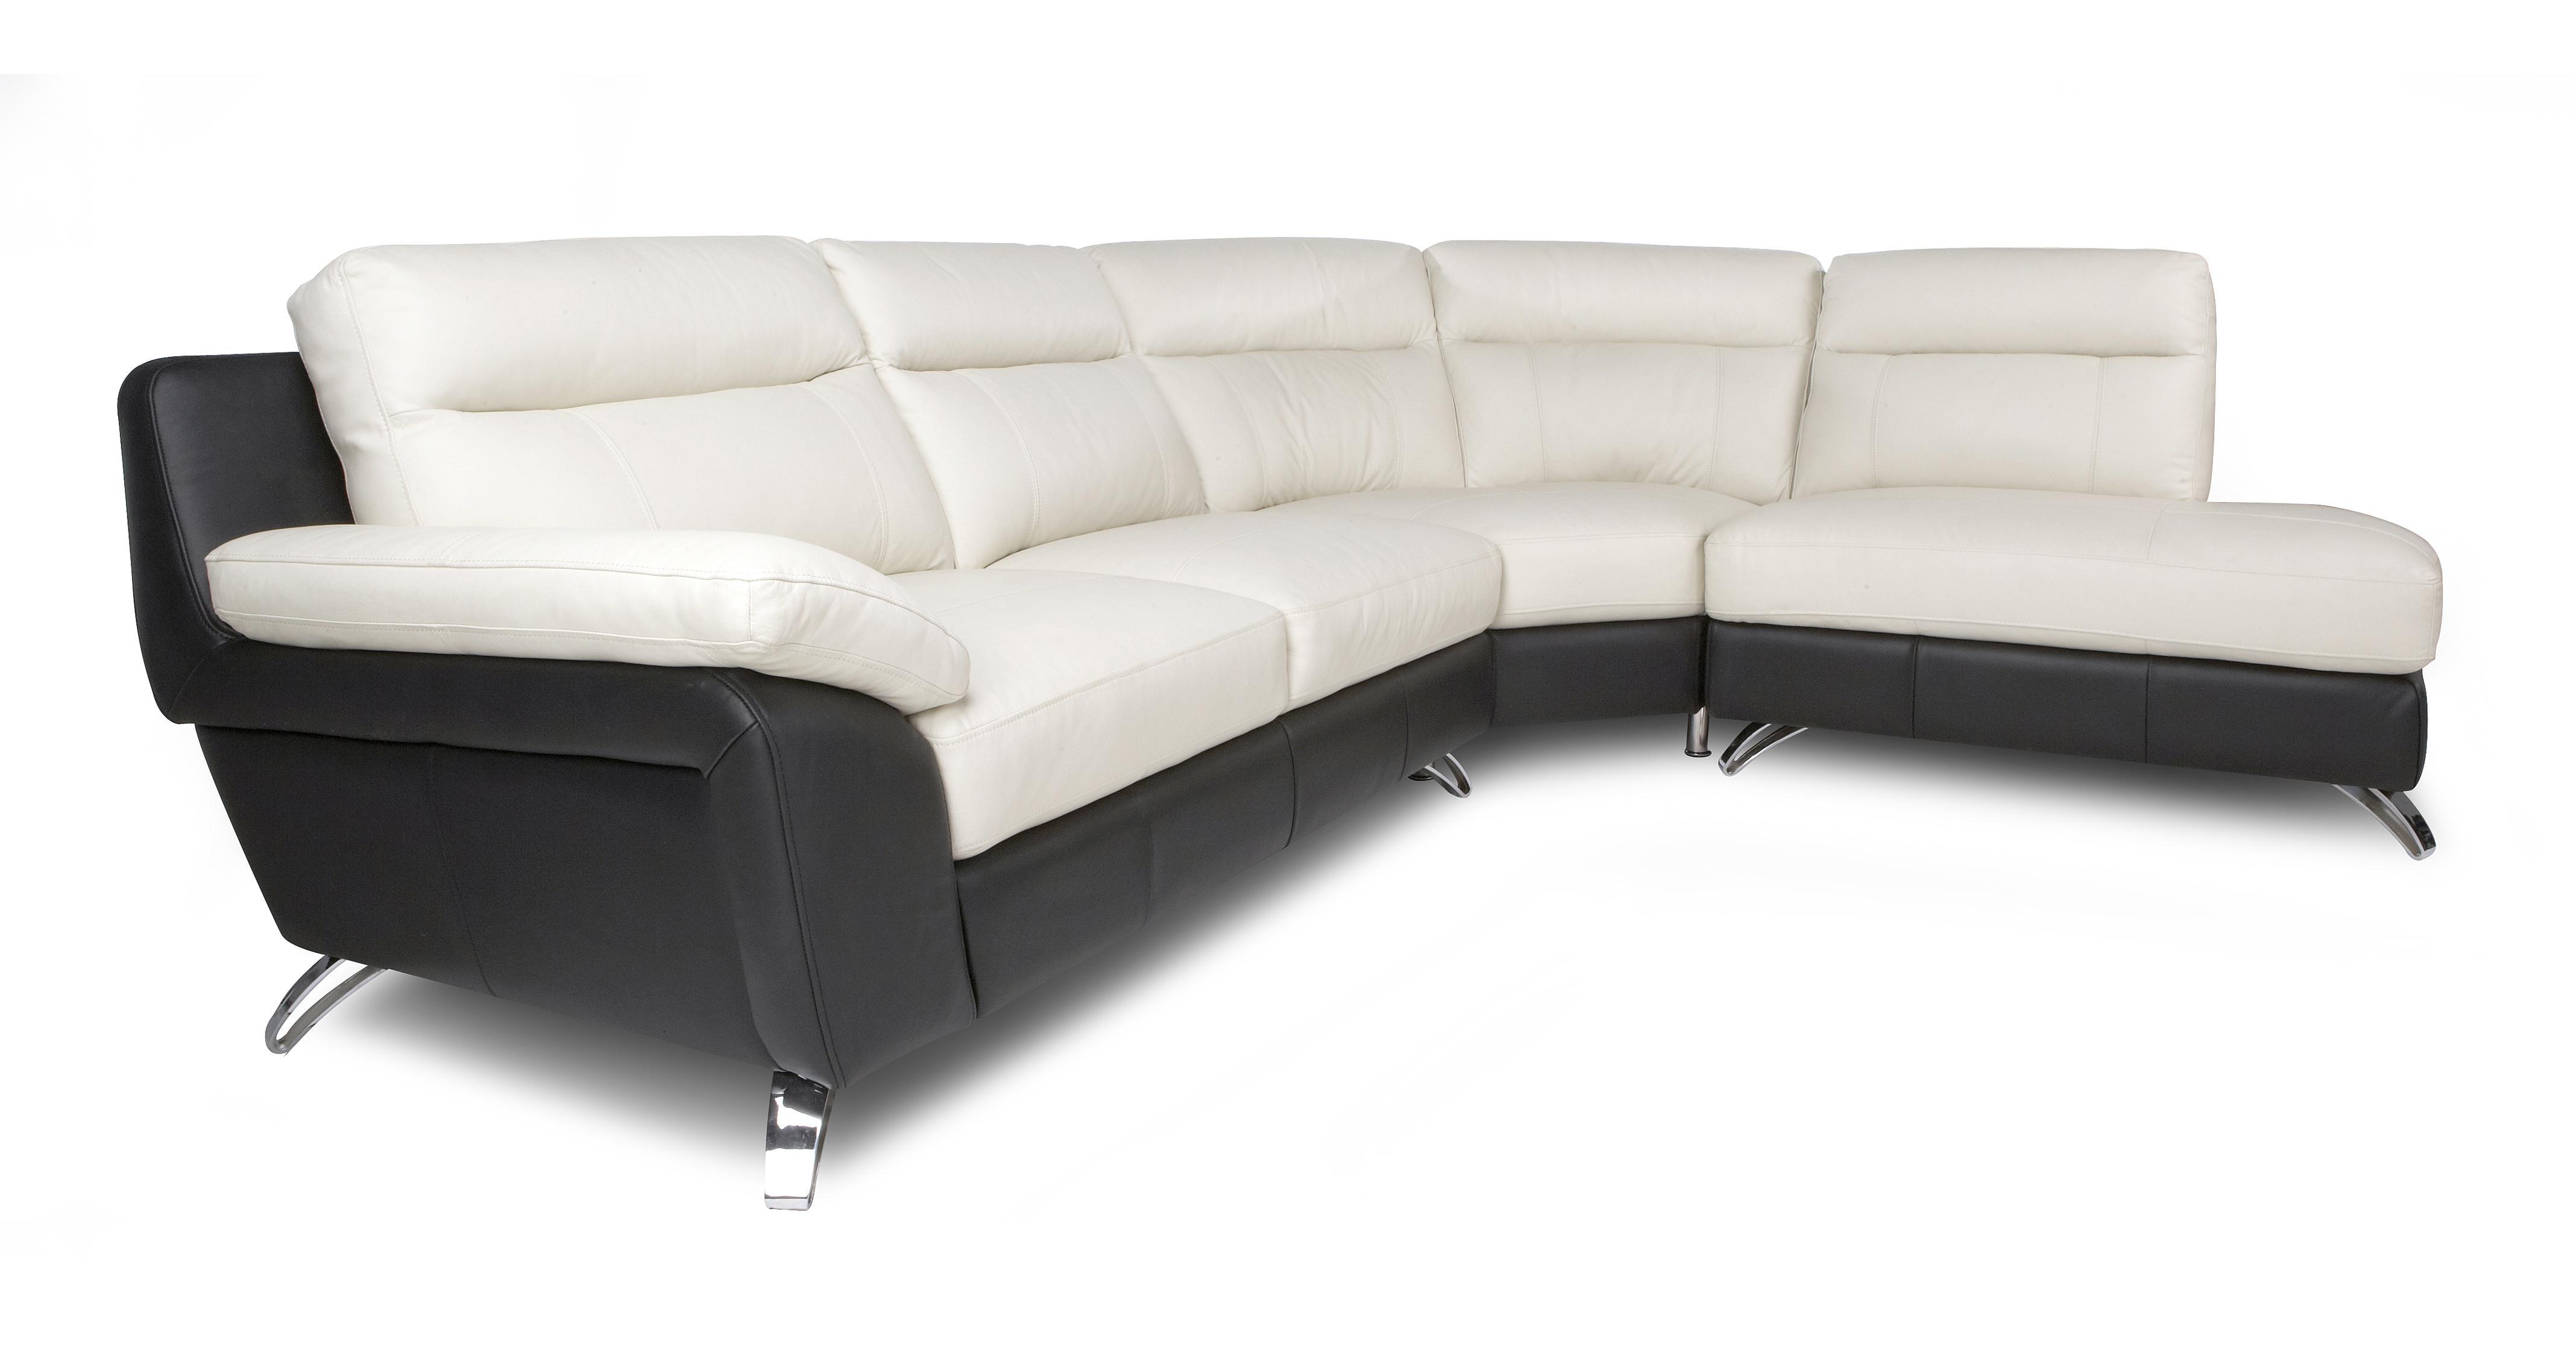 Peachy Dfs Linea Corner Sofa Reviews Looksisquare Com Squirreltailoven Fun Painted Chair Ideas Images Squirreltailovenorg